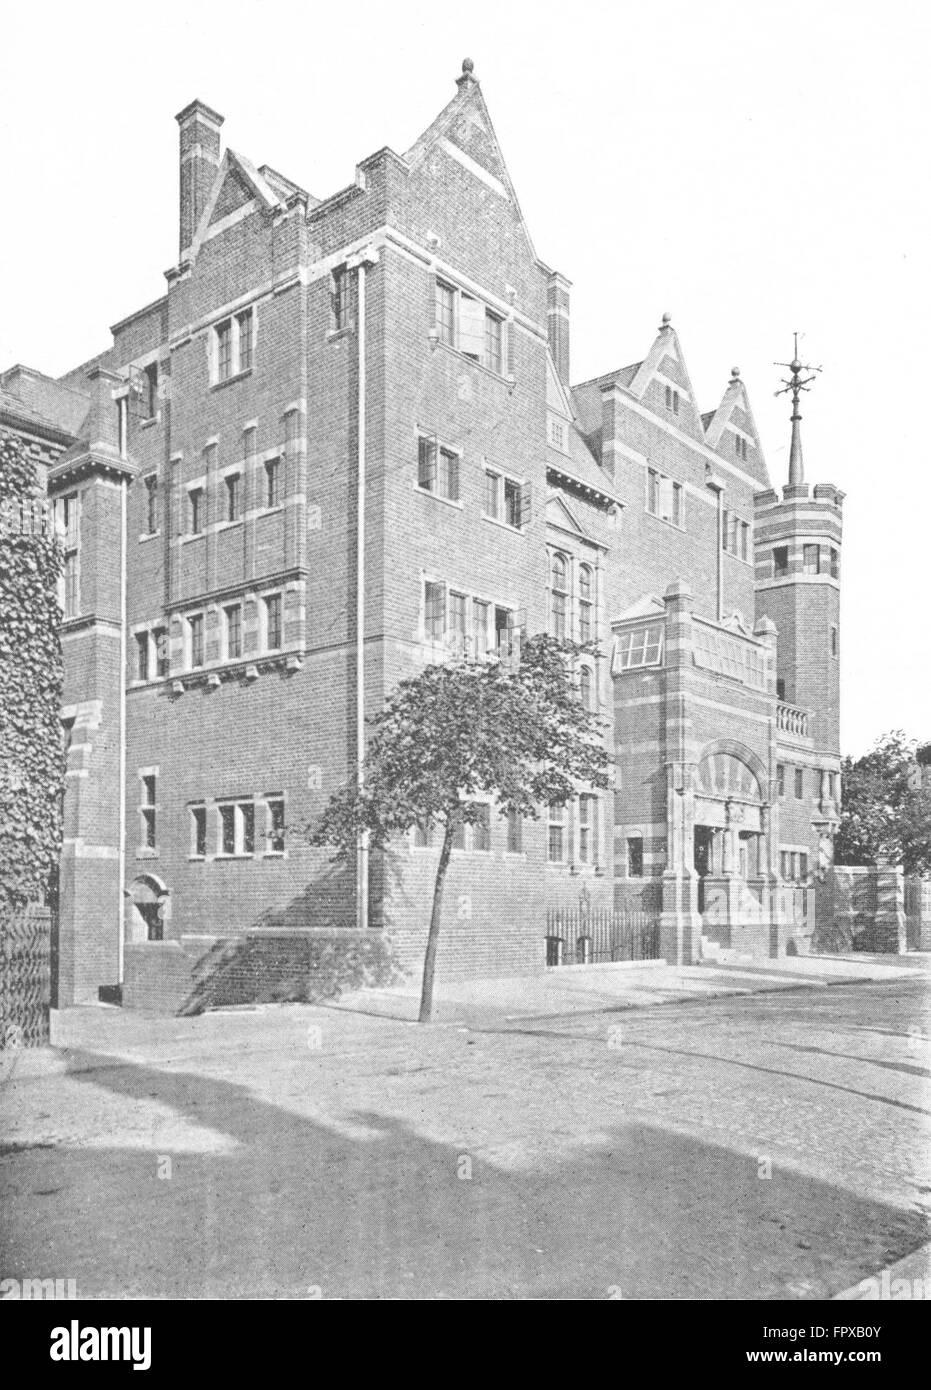 WORCESTER: Victoria Inst, Science School Sansome, antique print c1900 - Stock Image